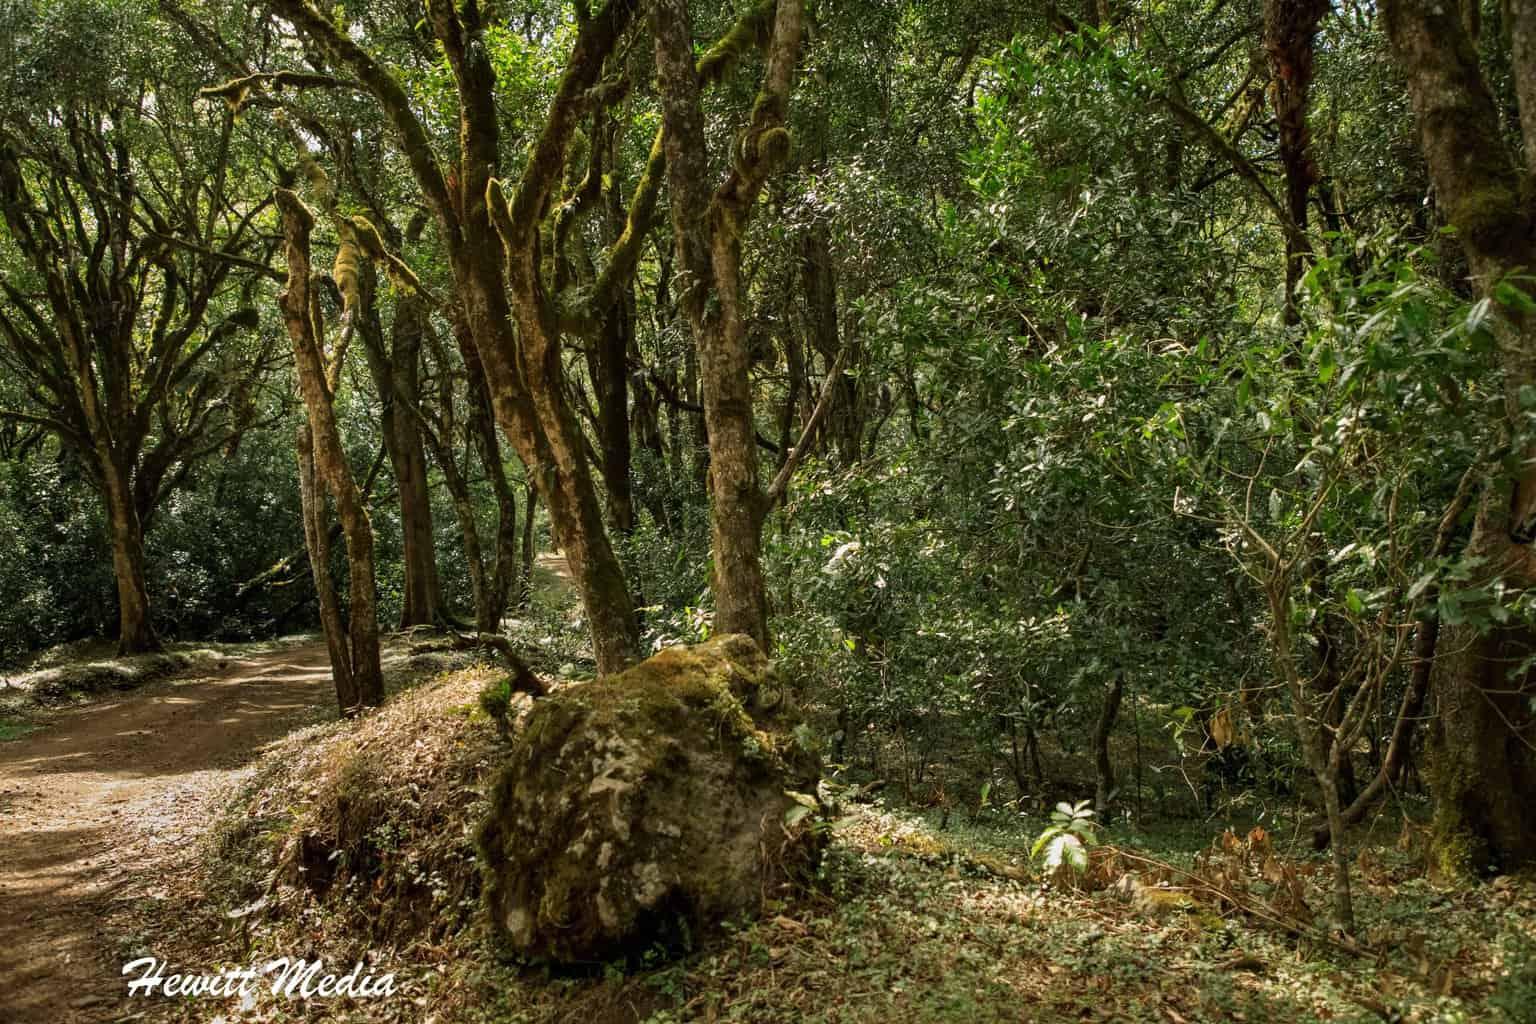 Forest inside Arusha National Park